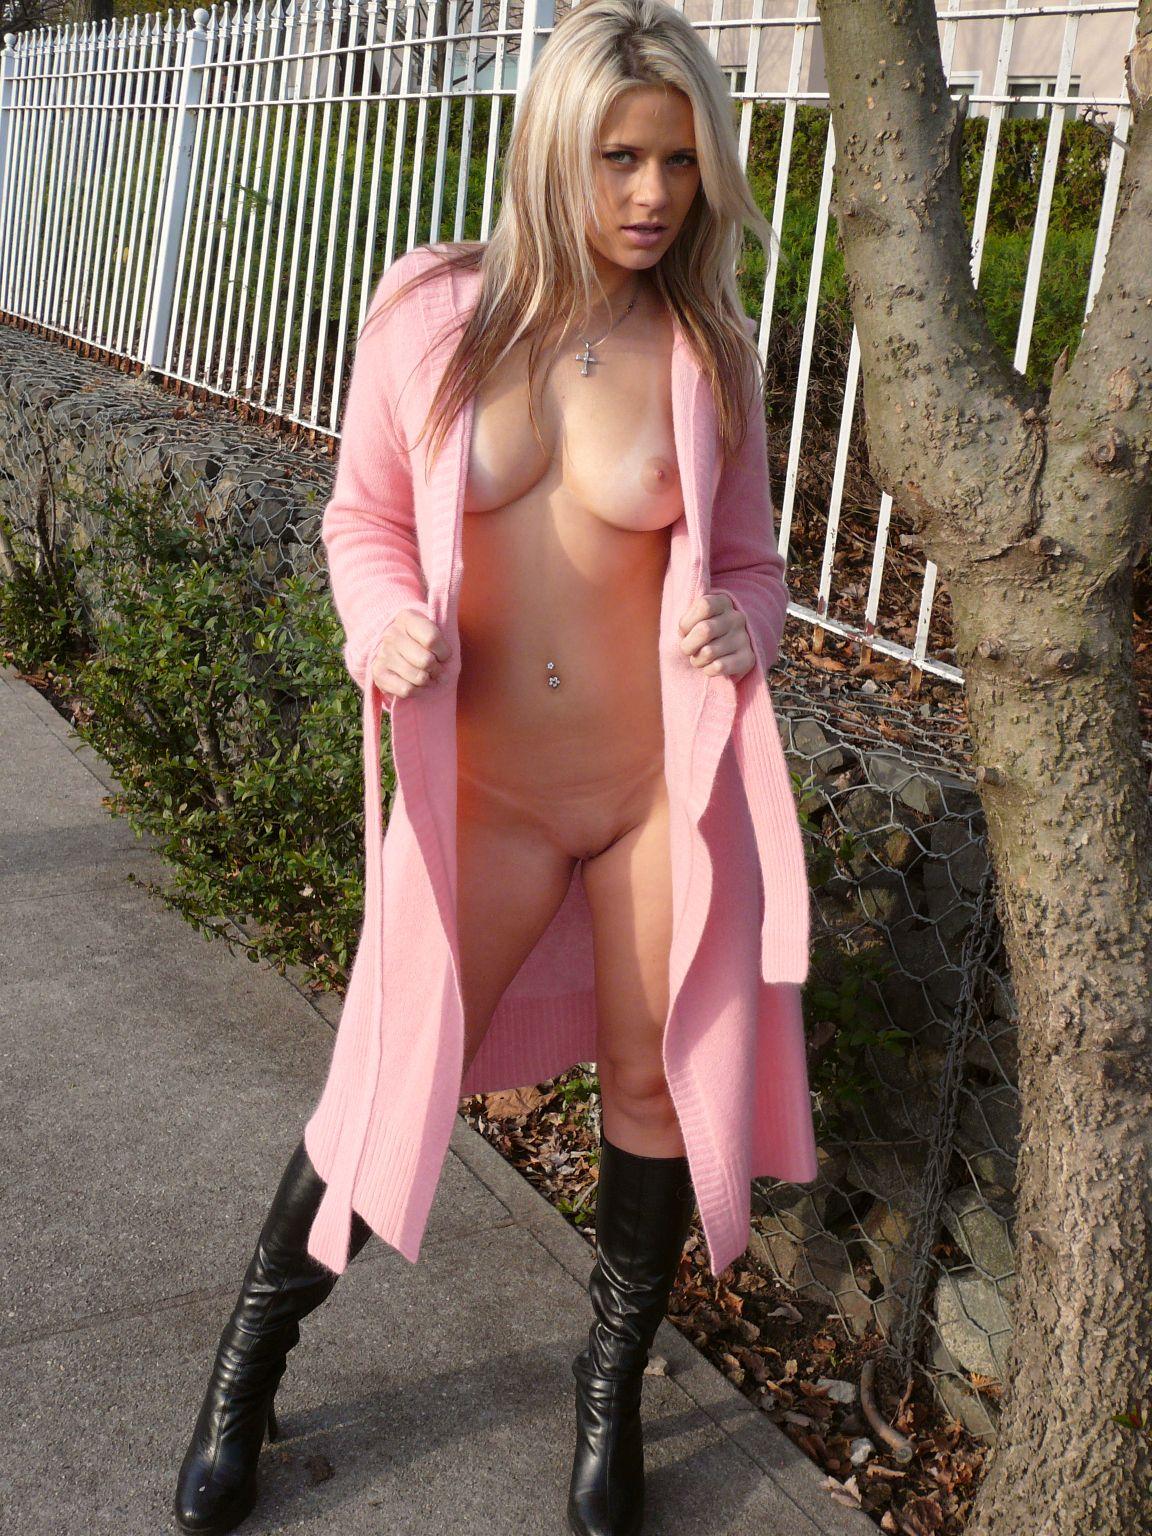 Visit Ann Angel For More Hotness